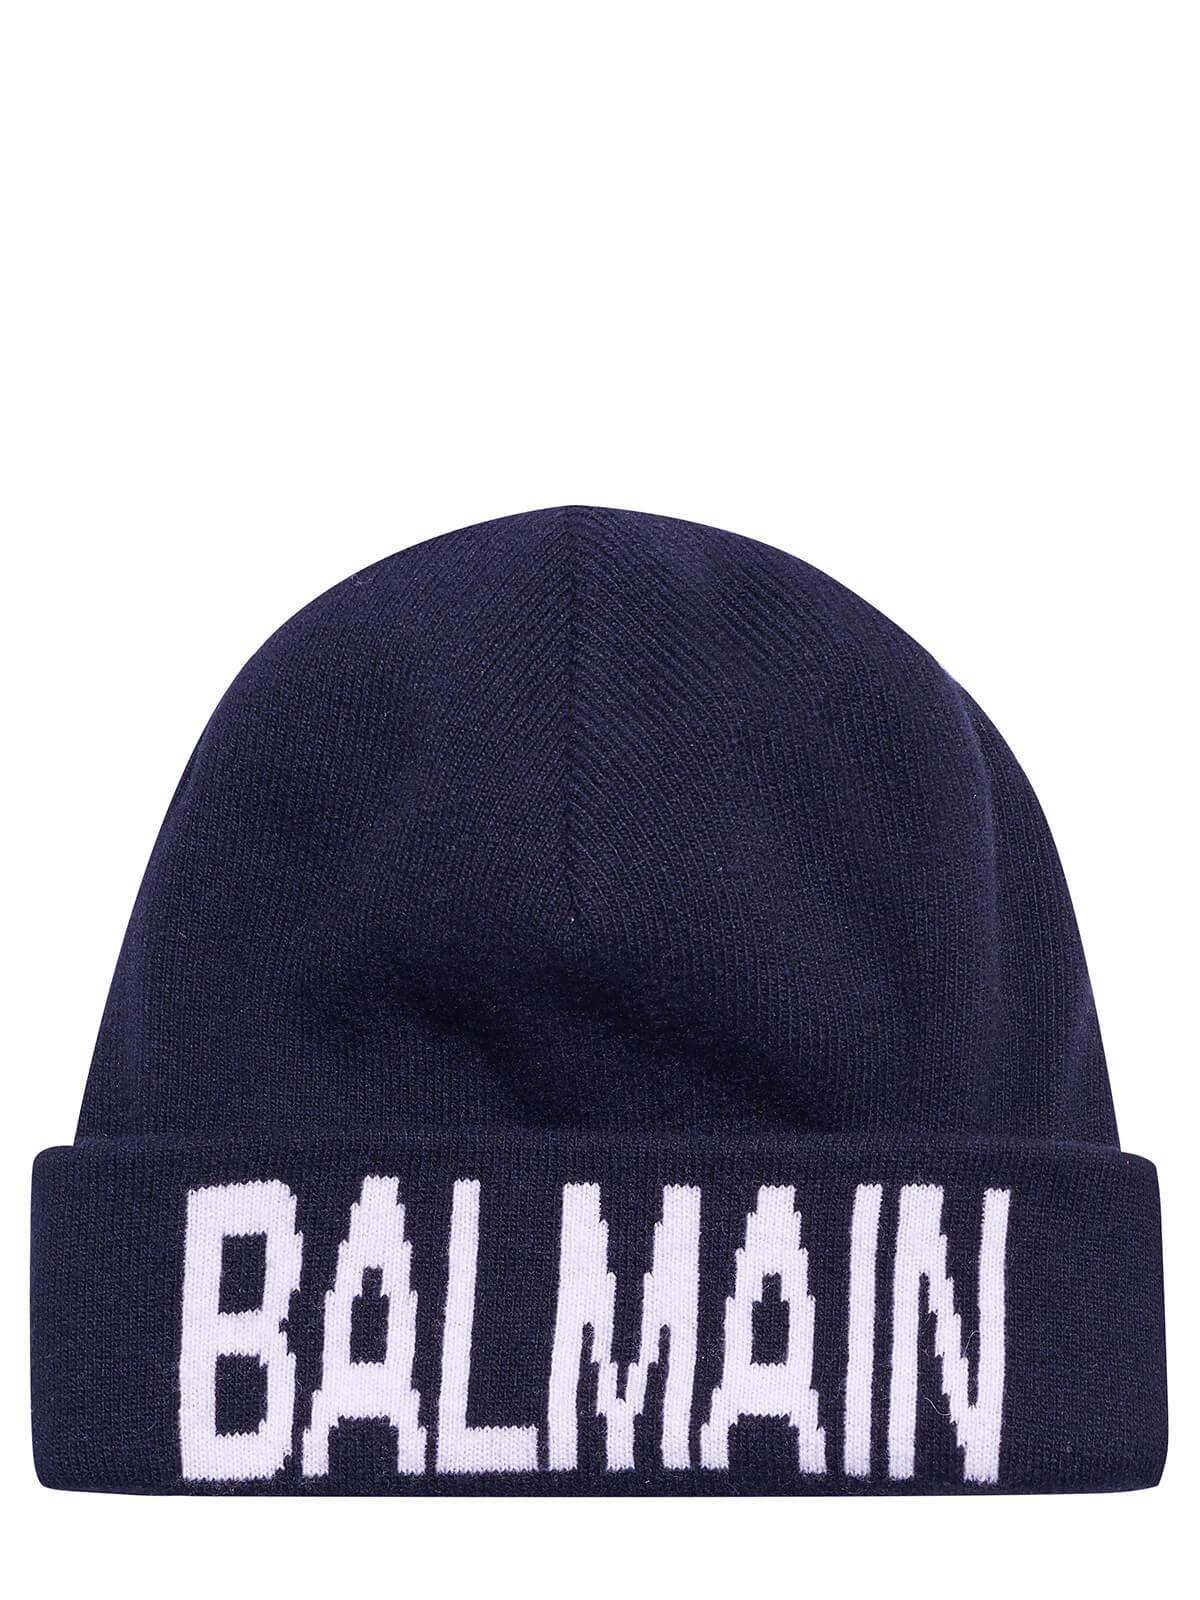 Balmain Cap Dark Blue by Balmain